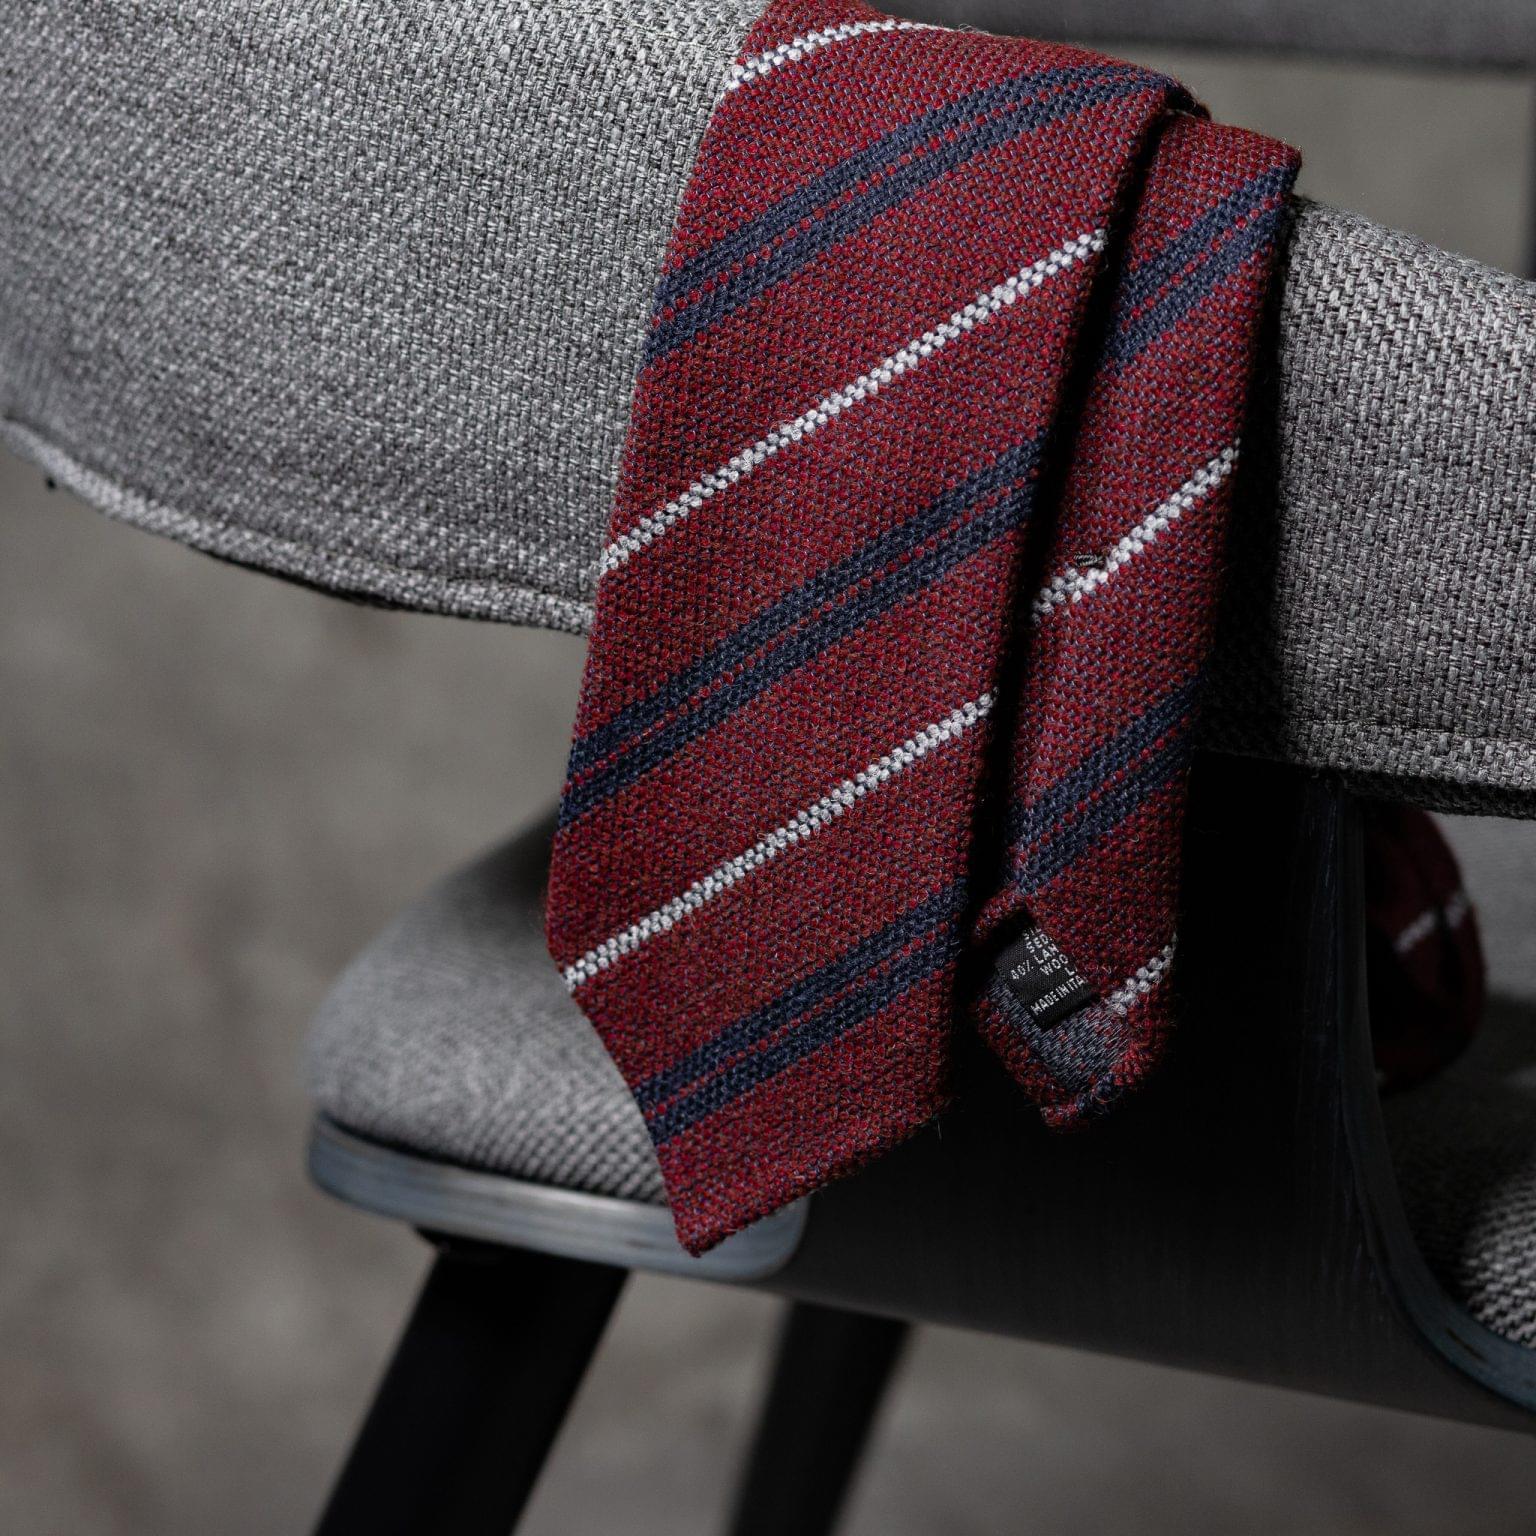 WOOL-LANA-0482-Tie-Initials-Corbata-Iniciales-The-Seelk-2